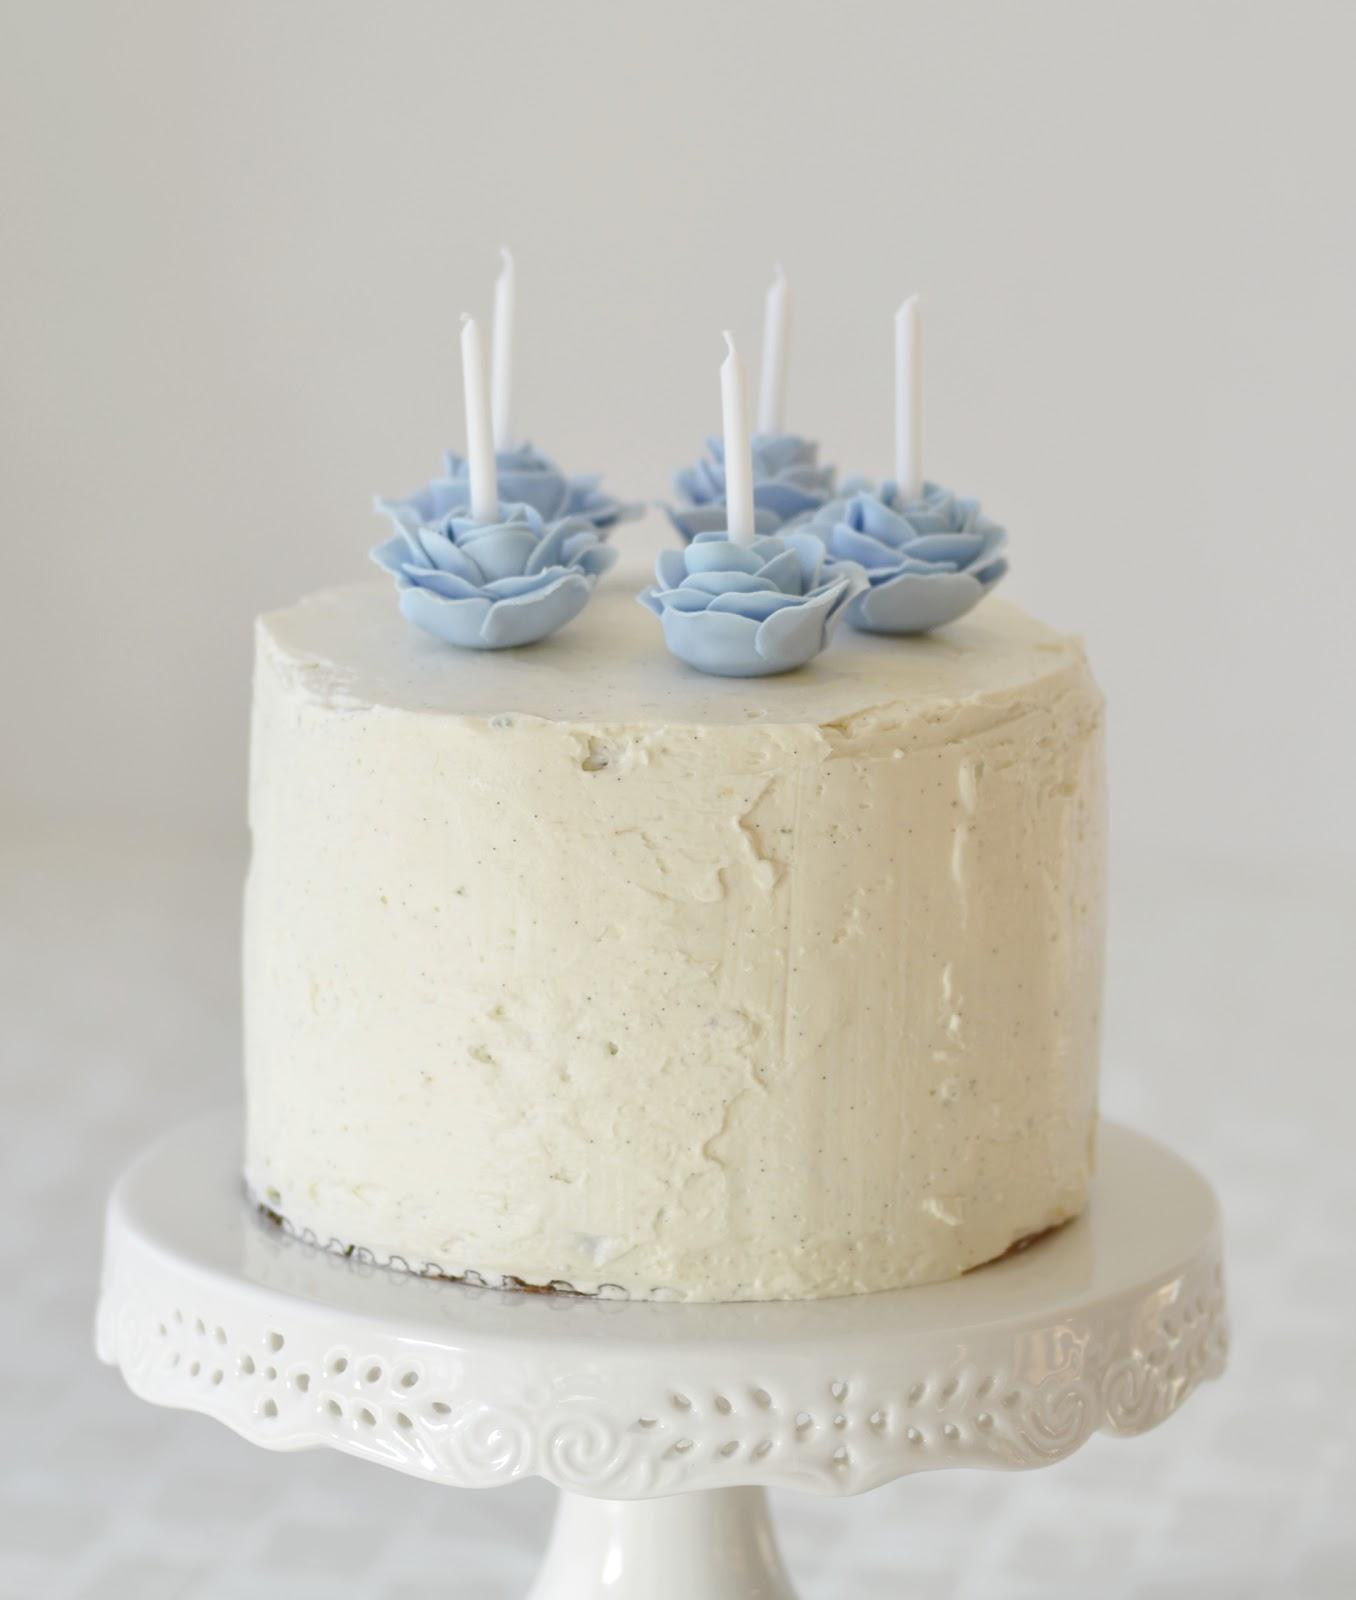 Earl Grey Butter Cake